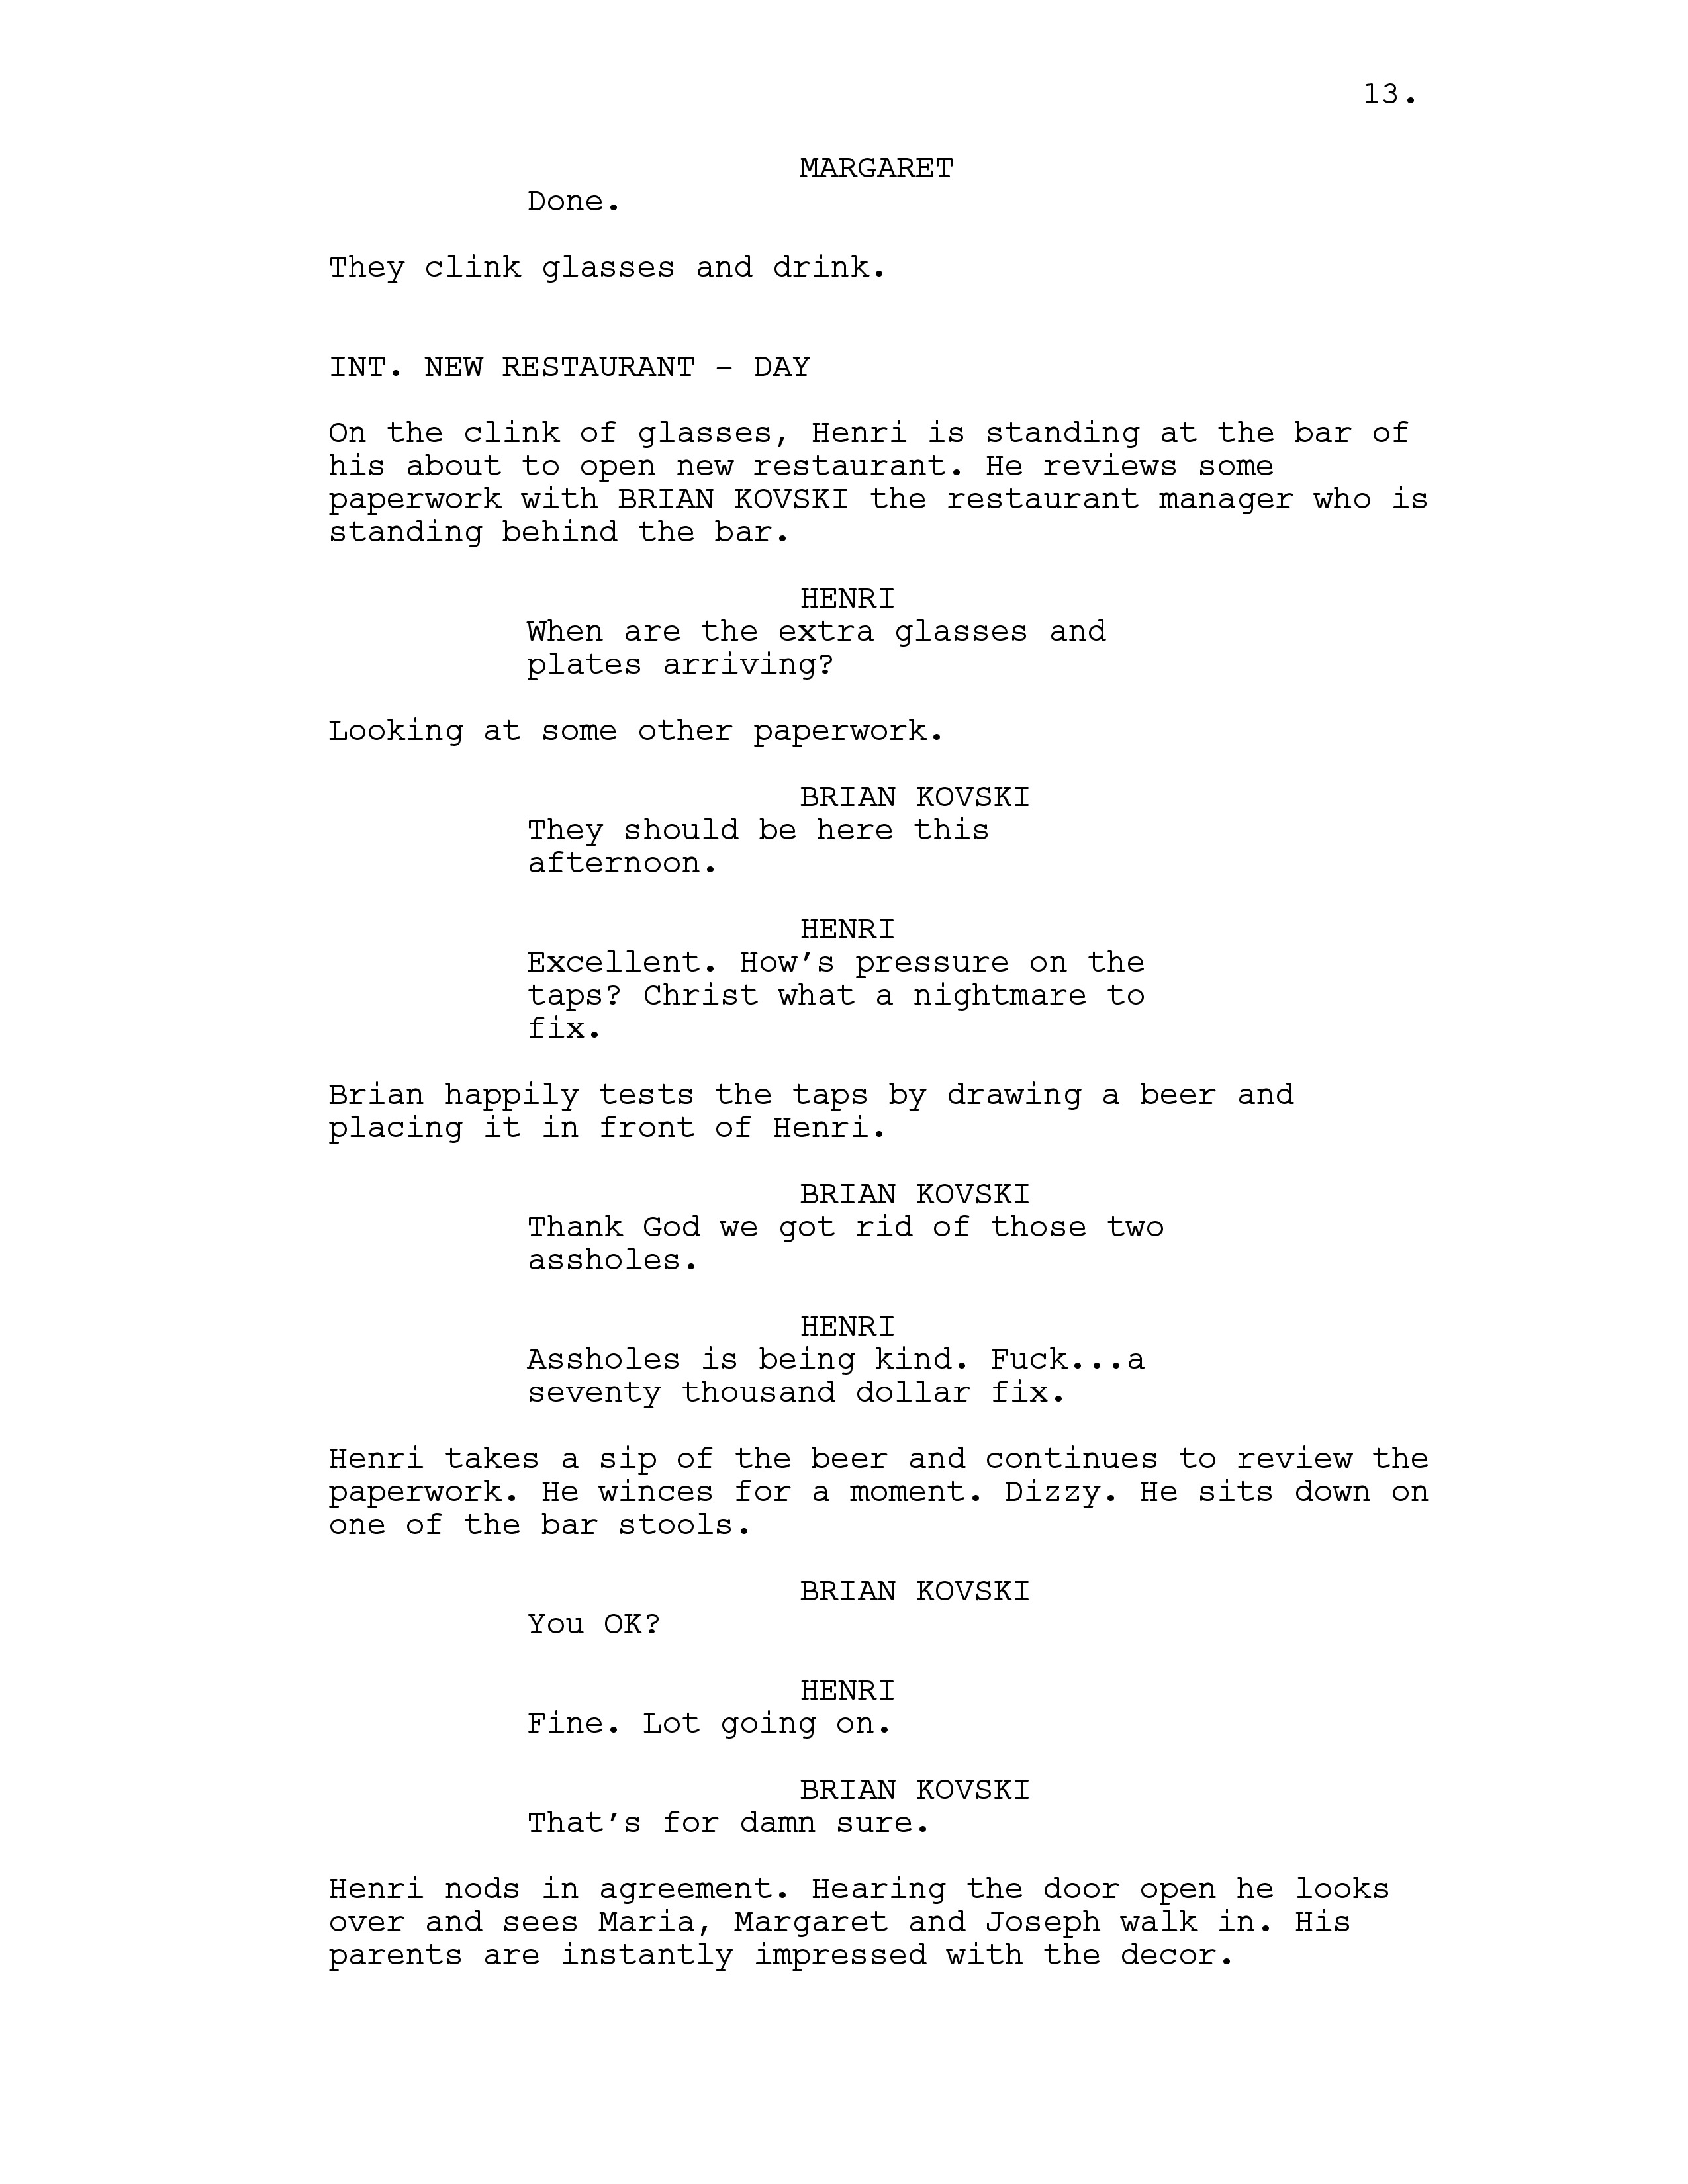 That scene in the script.